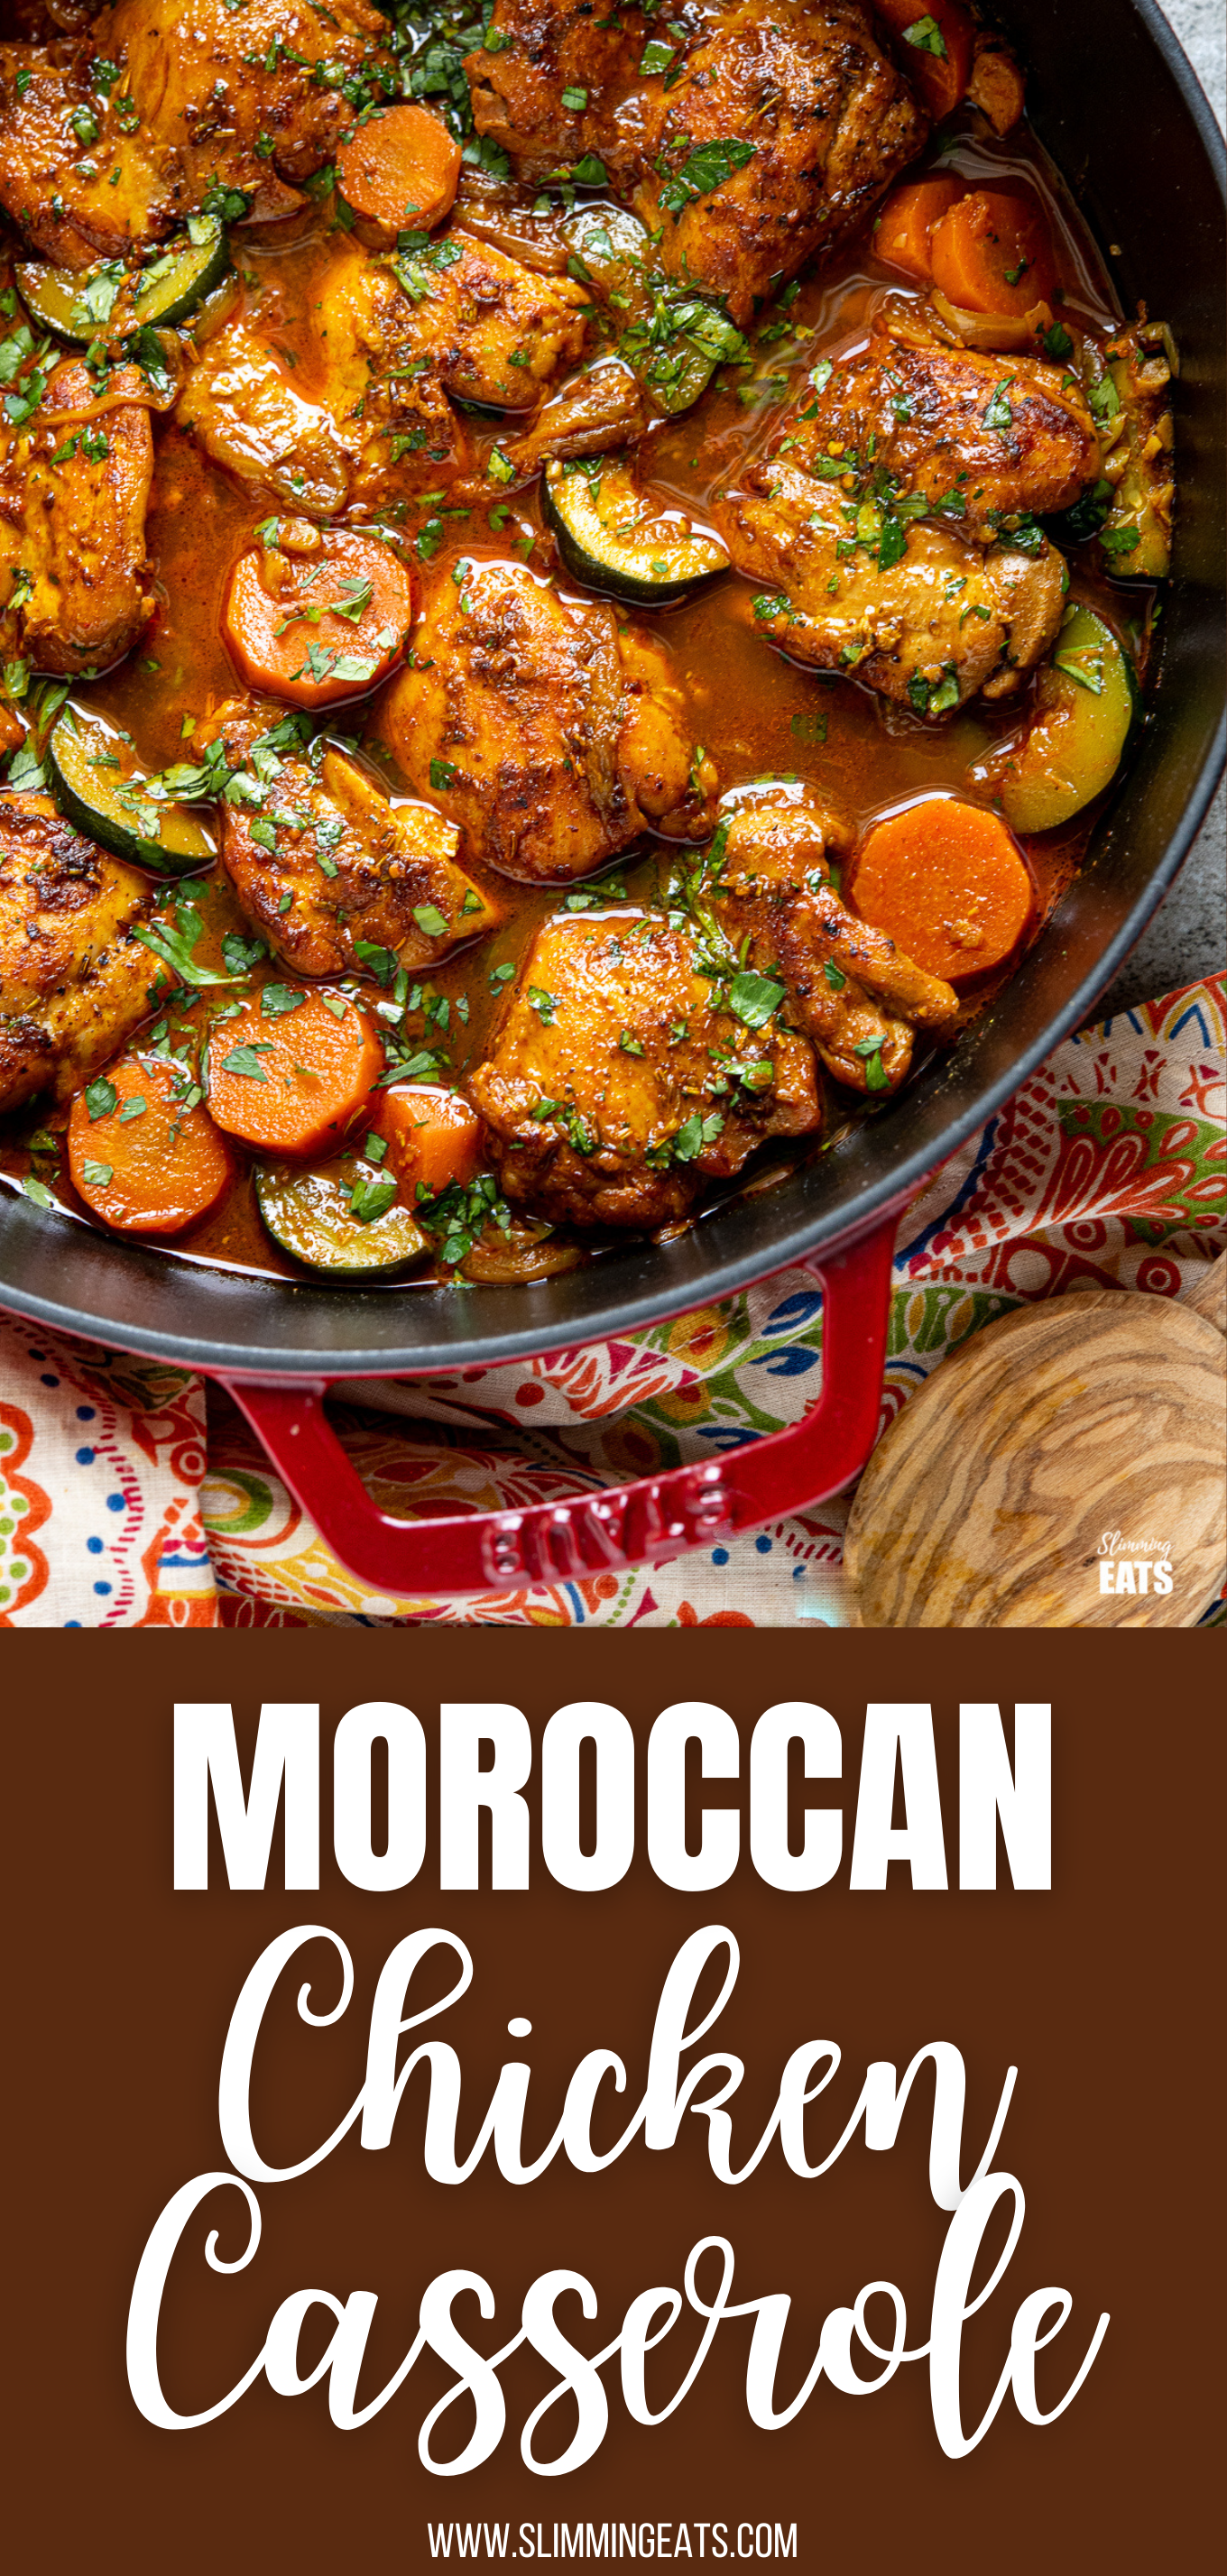 Moroccan Chicken Casserole in cherry cast iron pan